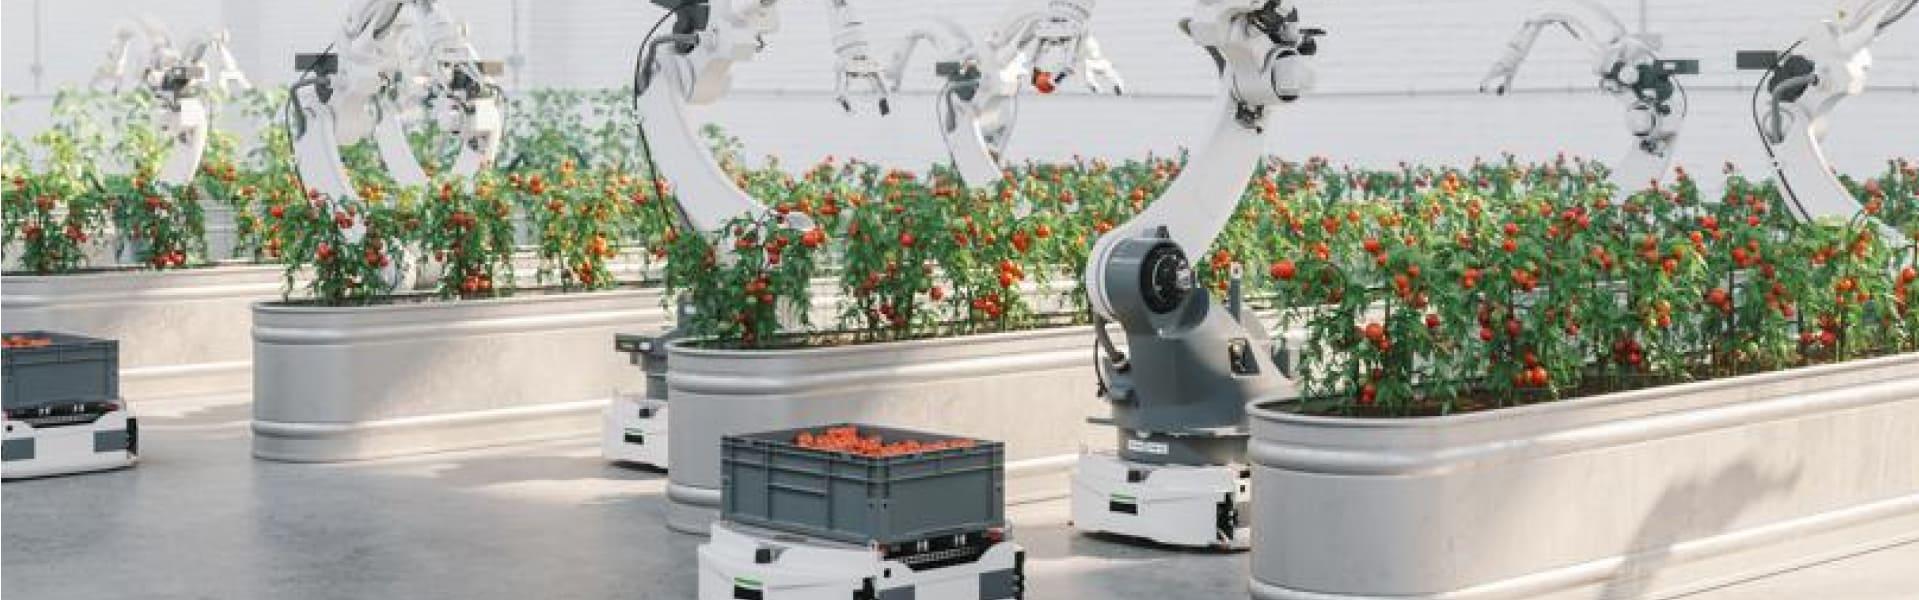 iot for urban farms